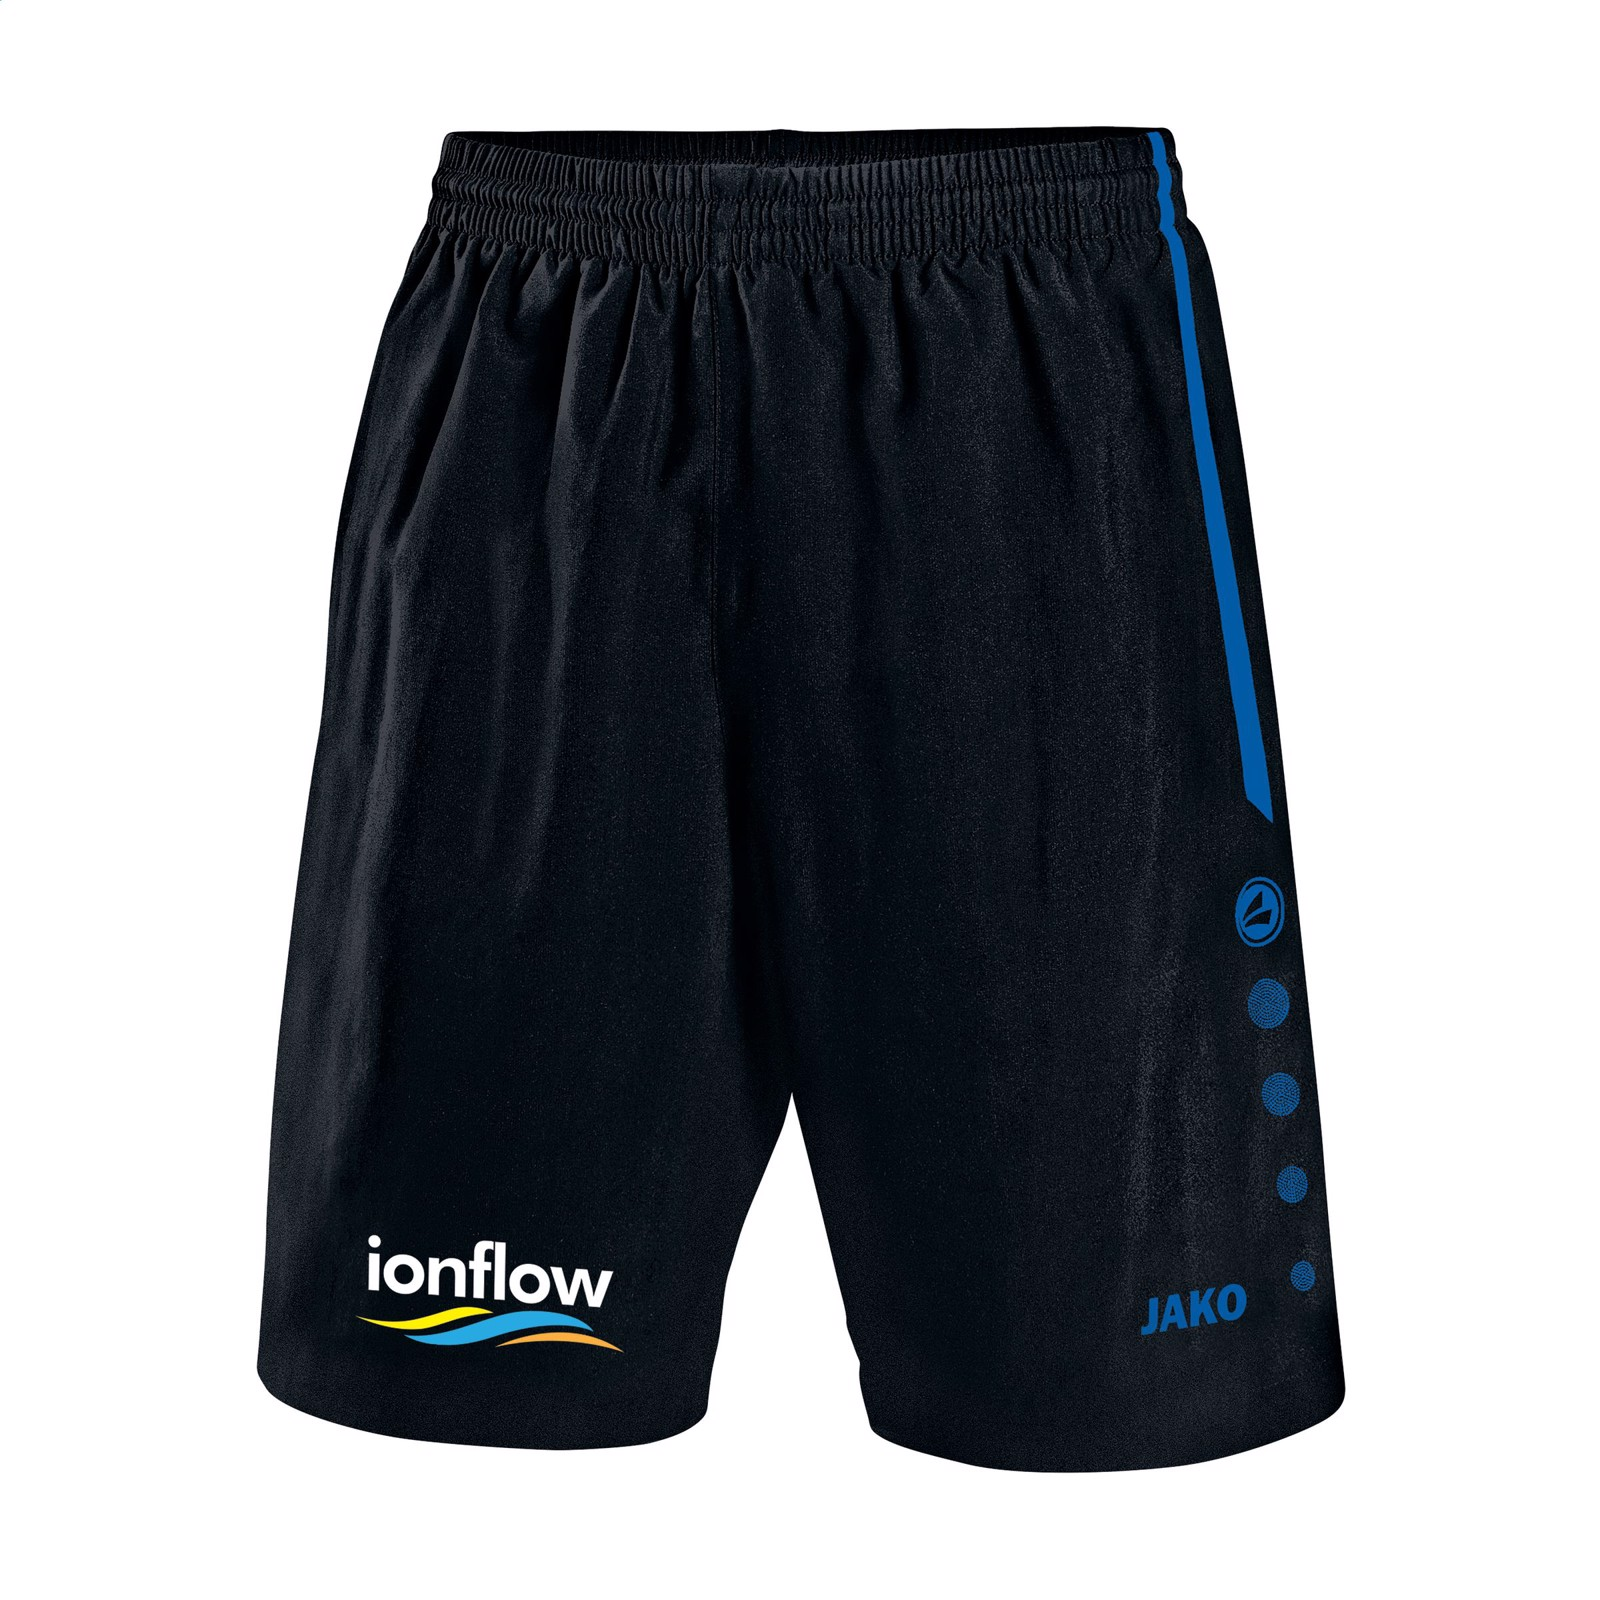 Jako® Shorts Turin mens - Black / Cobalt Blue / XL